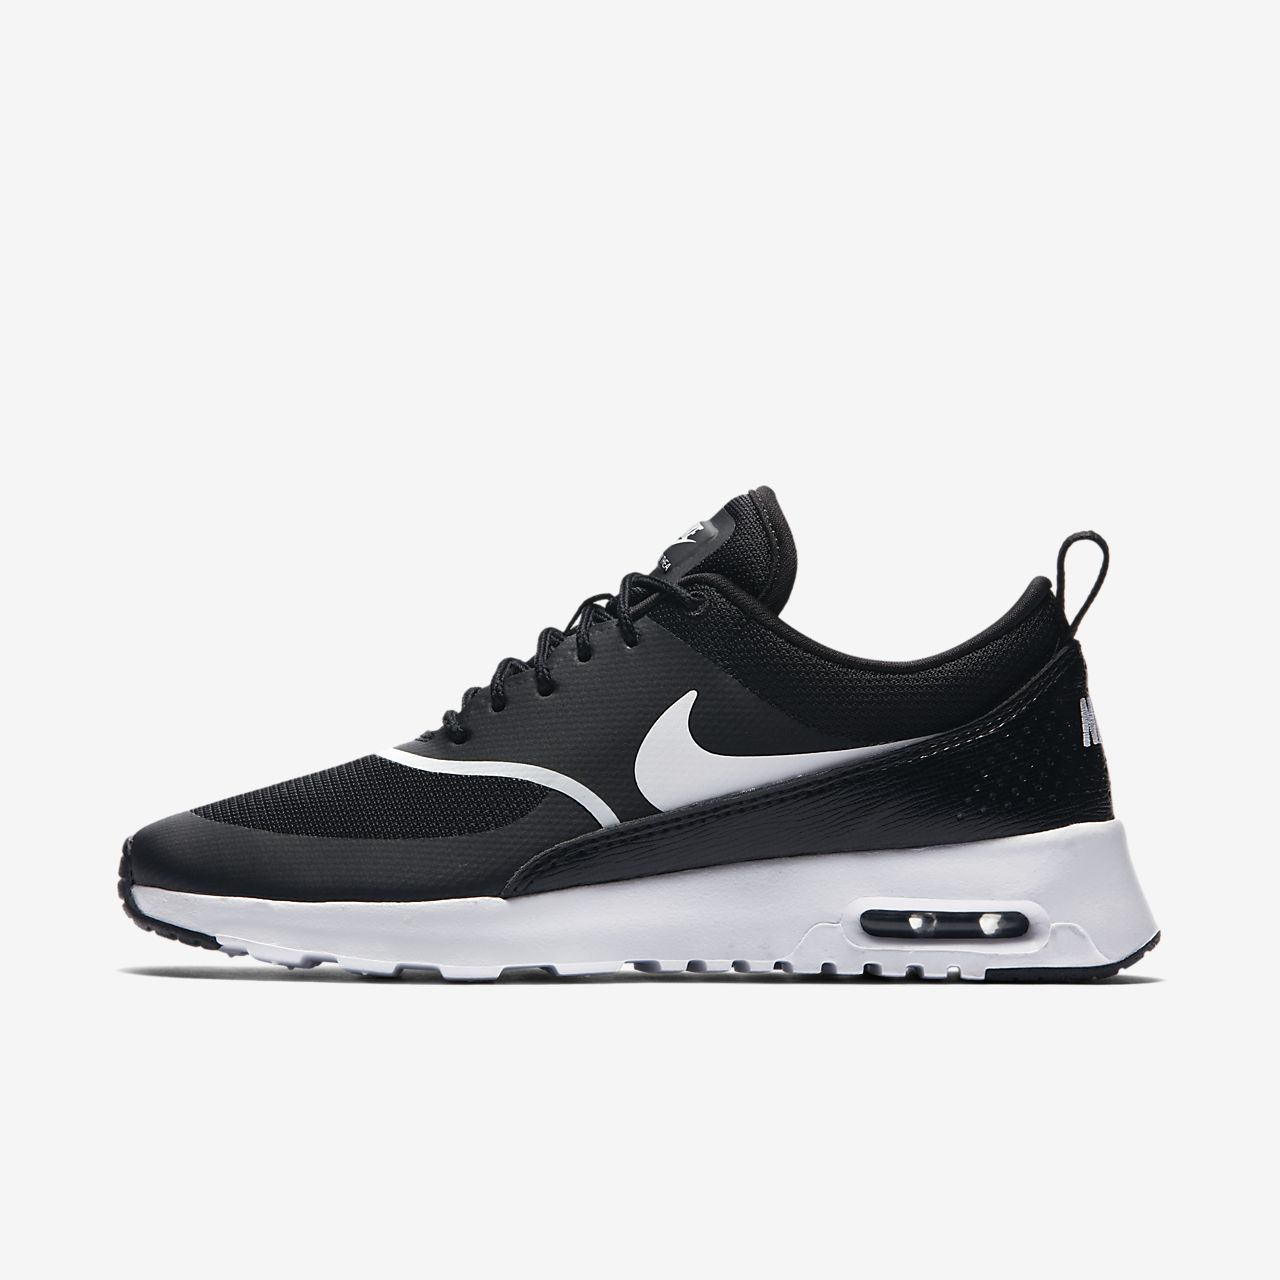 ac8f03104 Женские кроссовки Nike Air Max Thea. Nike.com RU